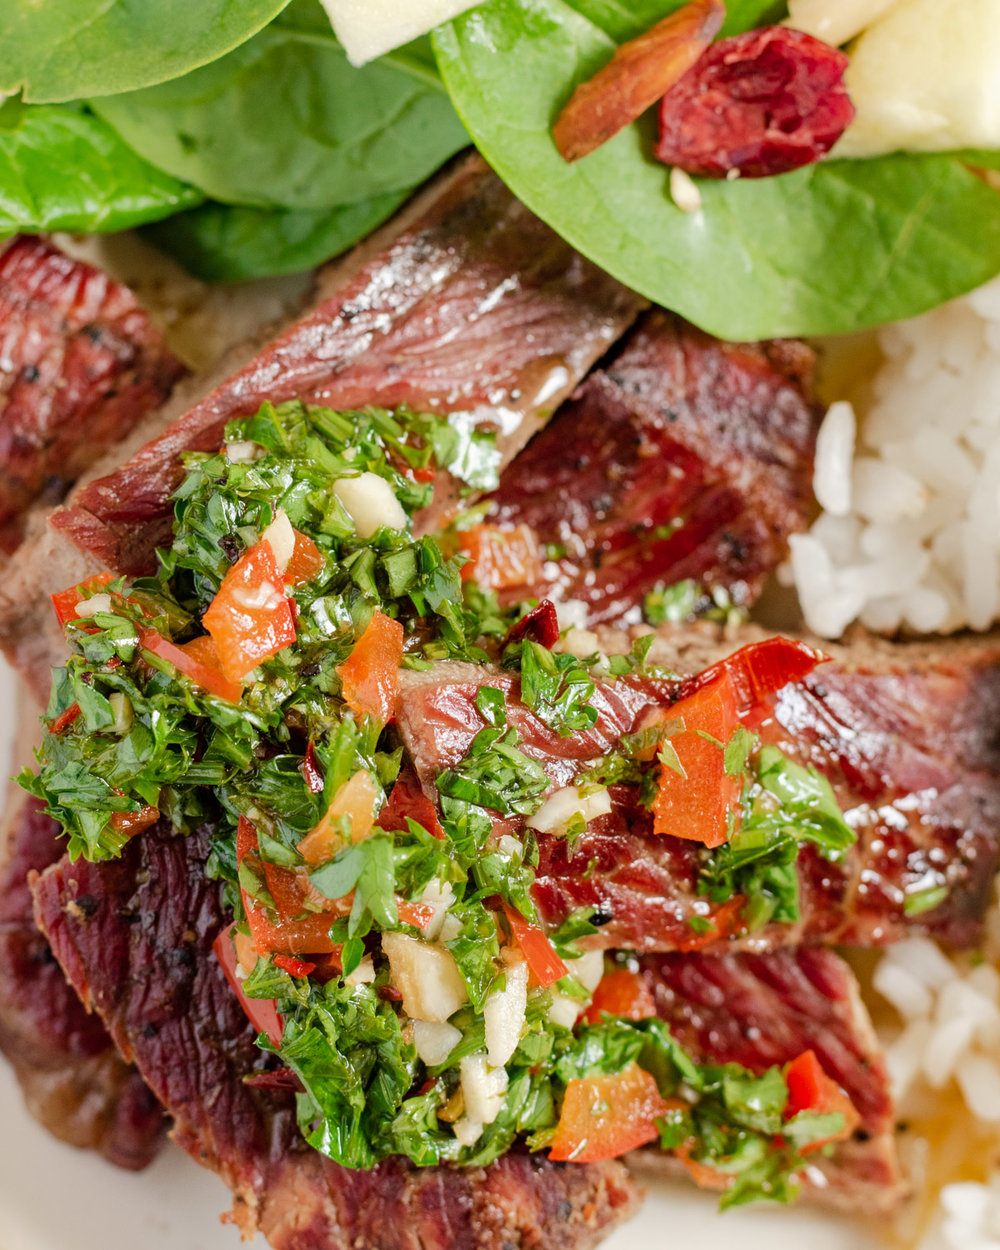 Chimichurri Sauce on Steak